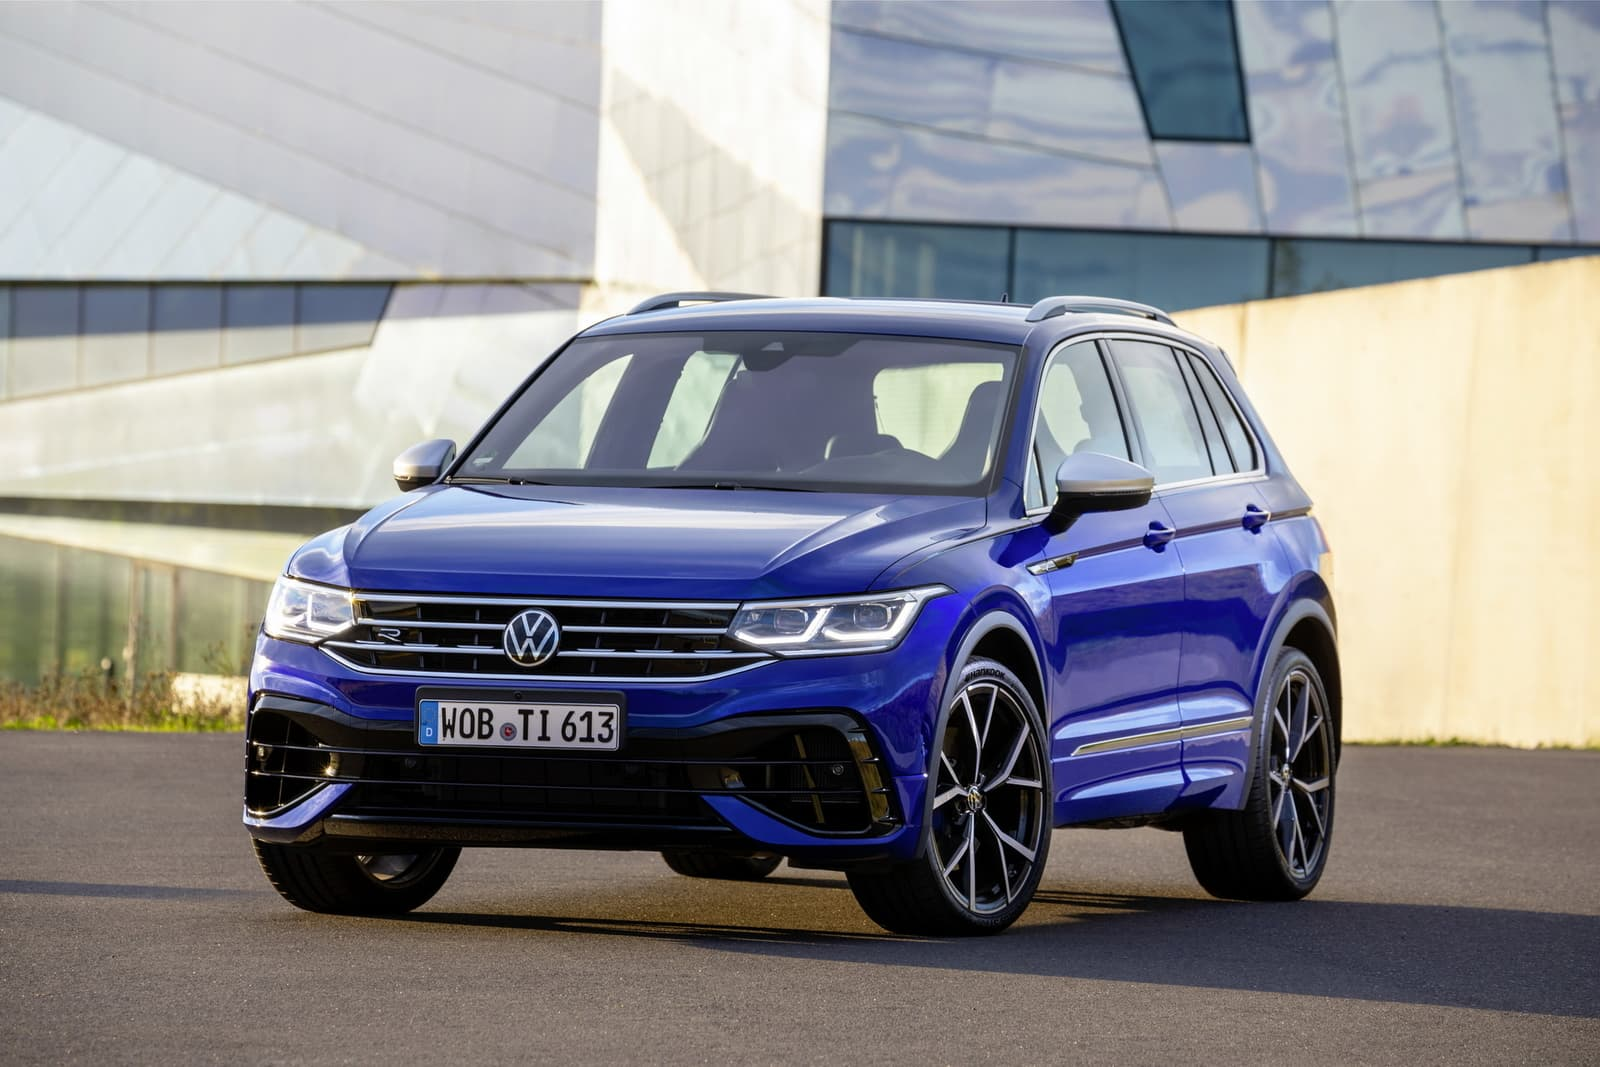 2021 Volkswagen Tiguan R Debuts With 315HP Engine